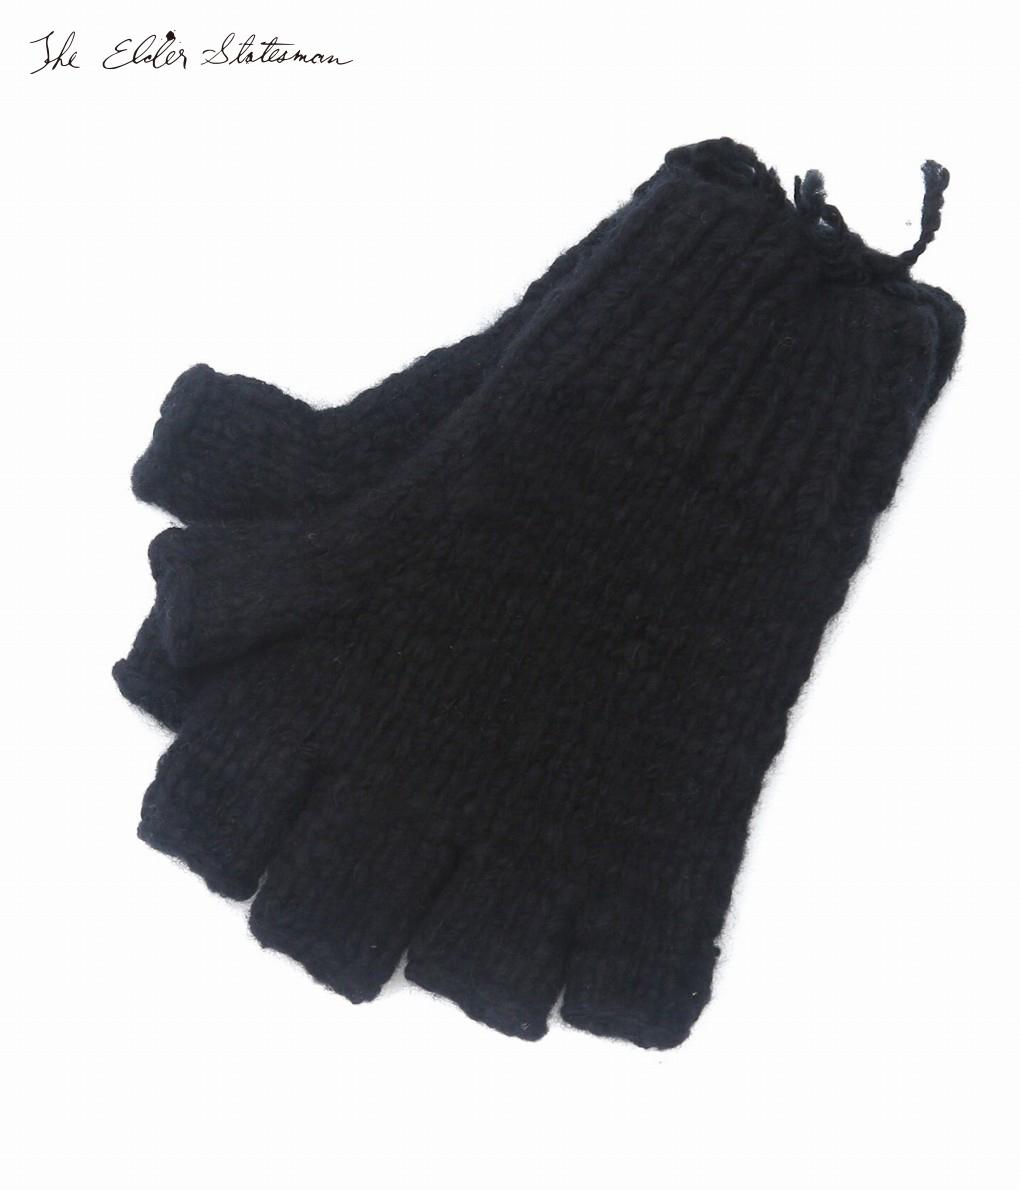 The Elder Statesman / ジ エルダー ステイツマン : fingerless gloves-BLACK- : フィンガーレス 手袋 グローブ メンズ : FG-FINGERLESS 【RIP】【BJB】